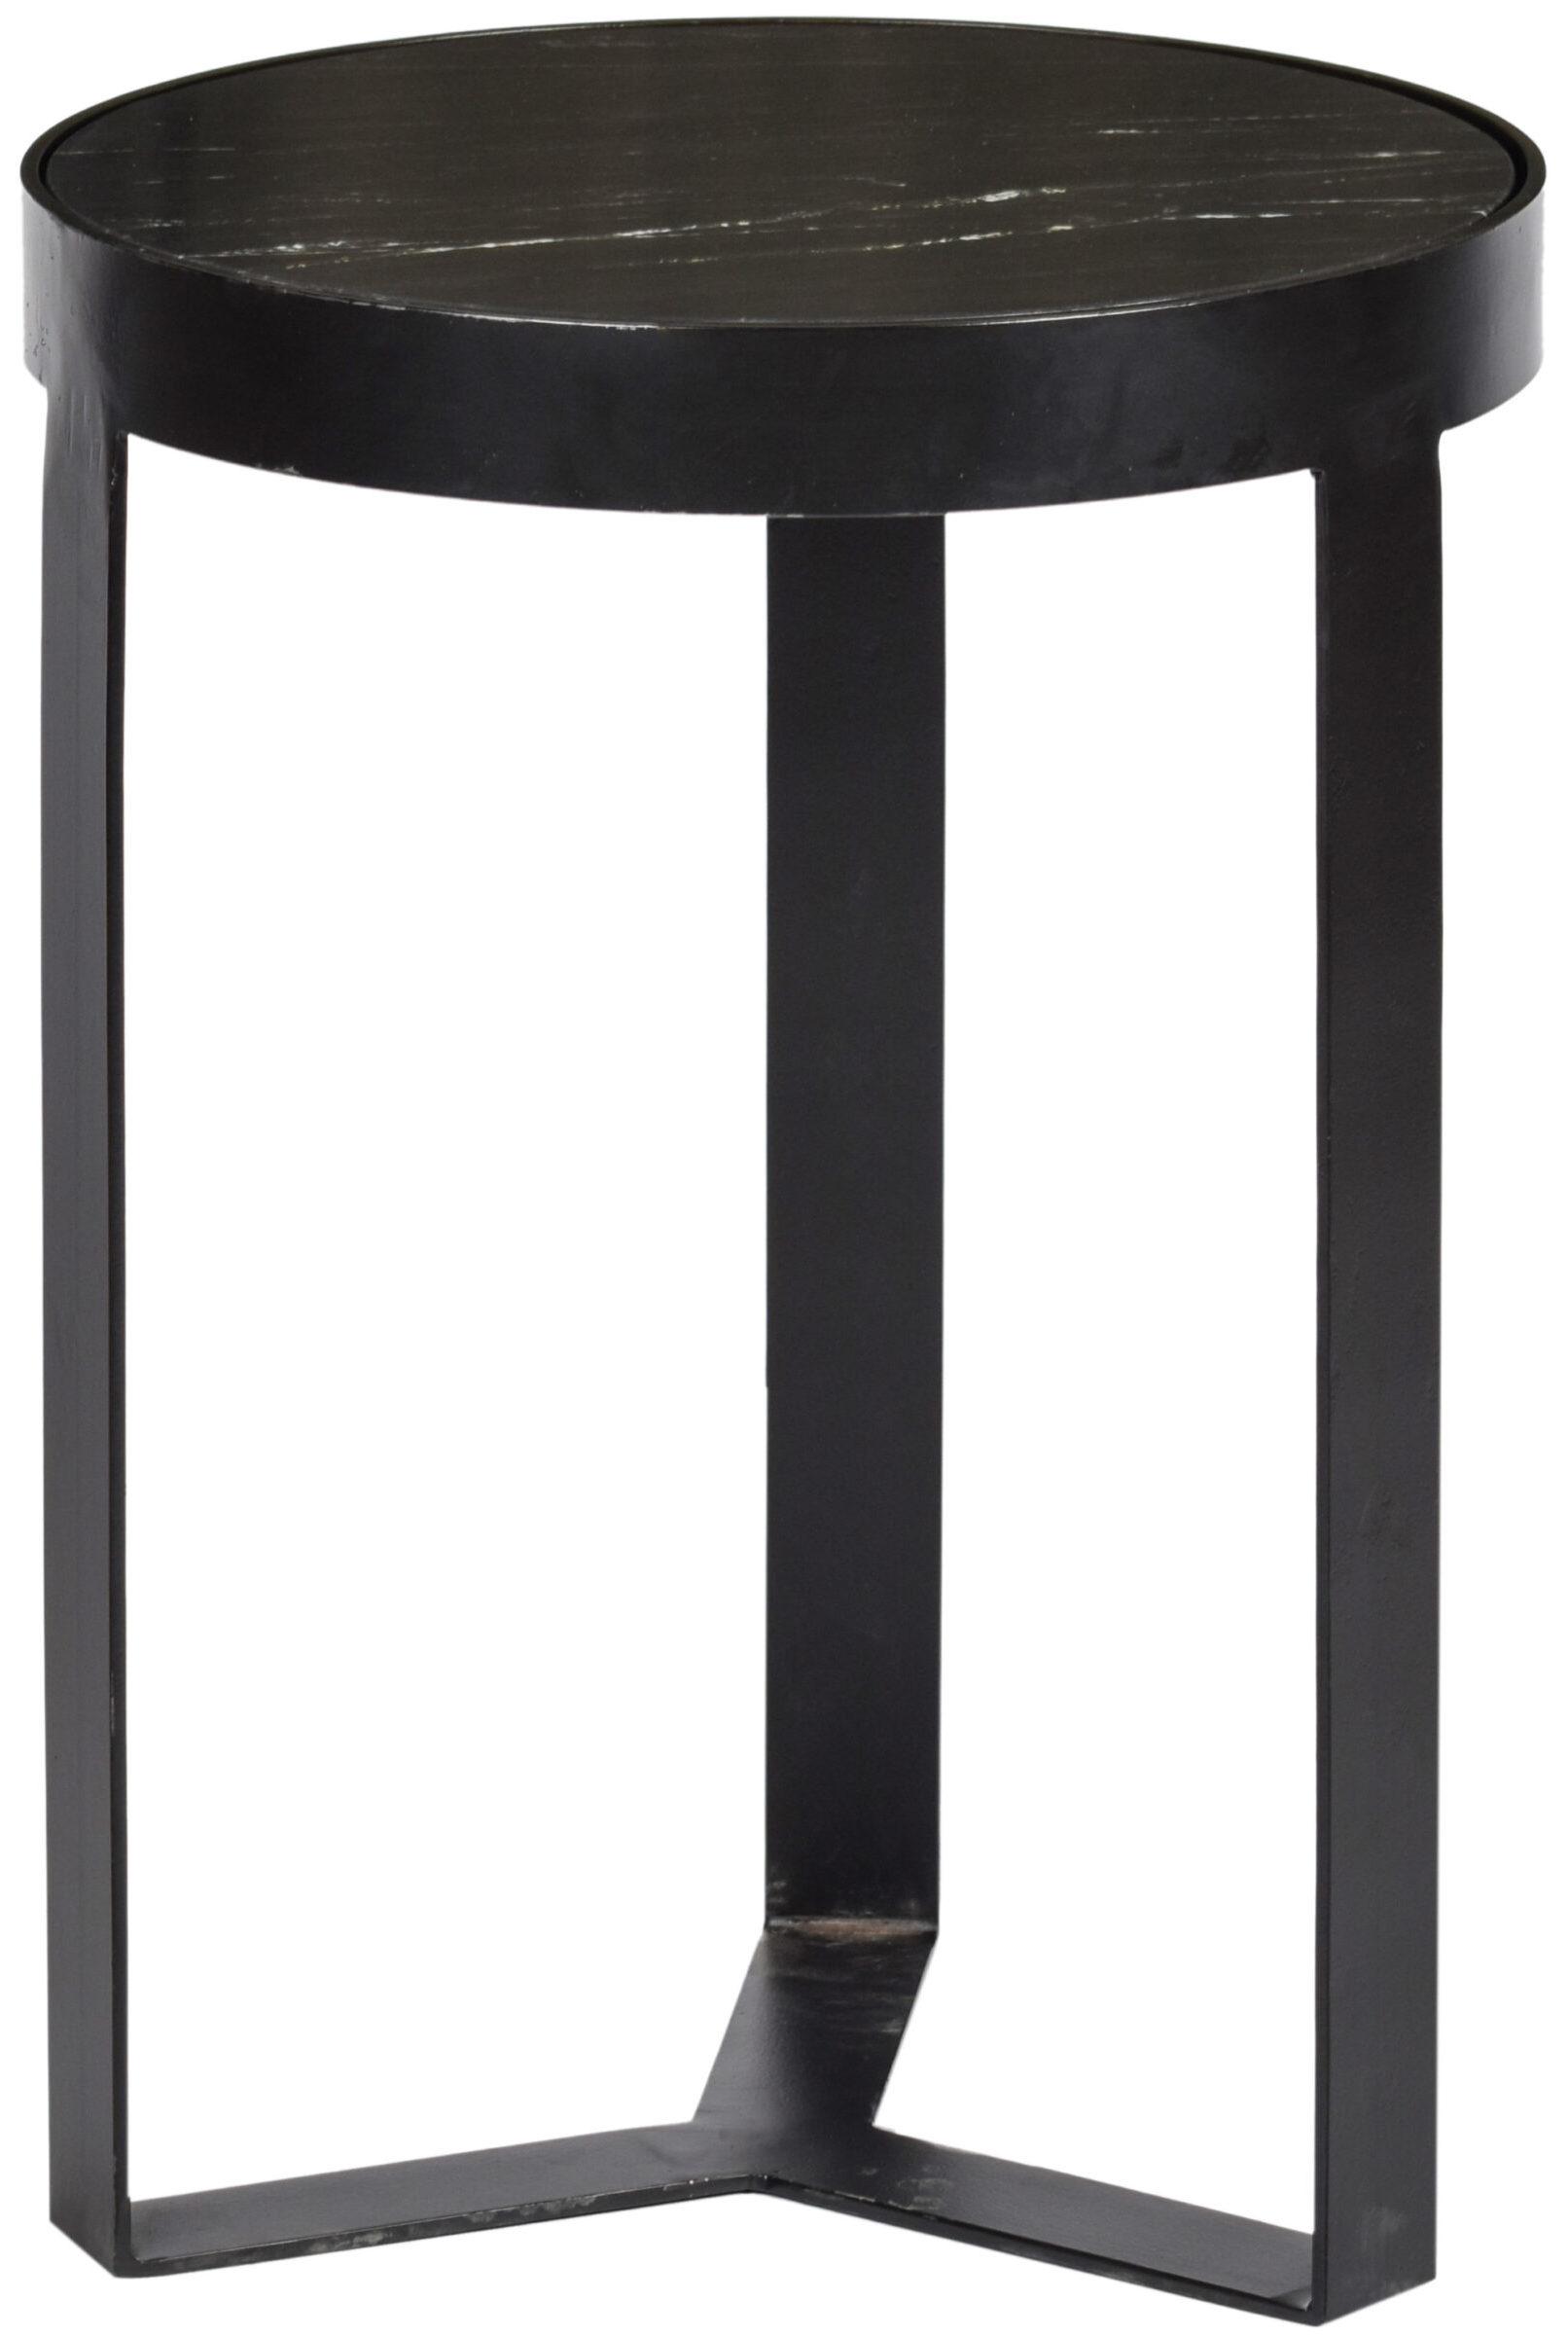 Livingfurn Bijzettafel Glennis Marble Black Black 40 cm  Bijzettafel